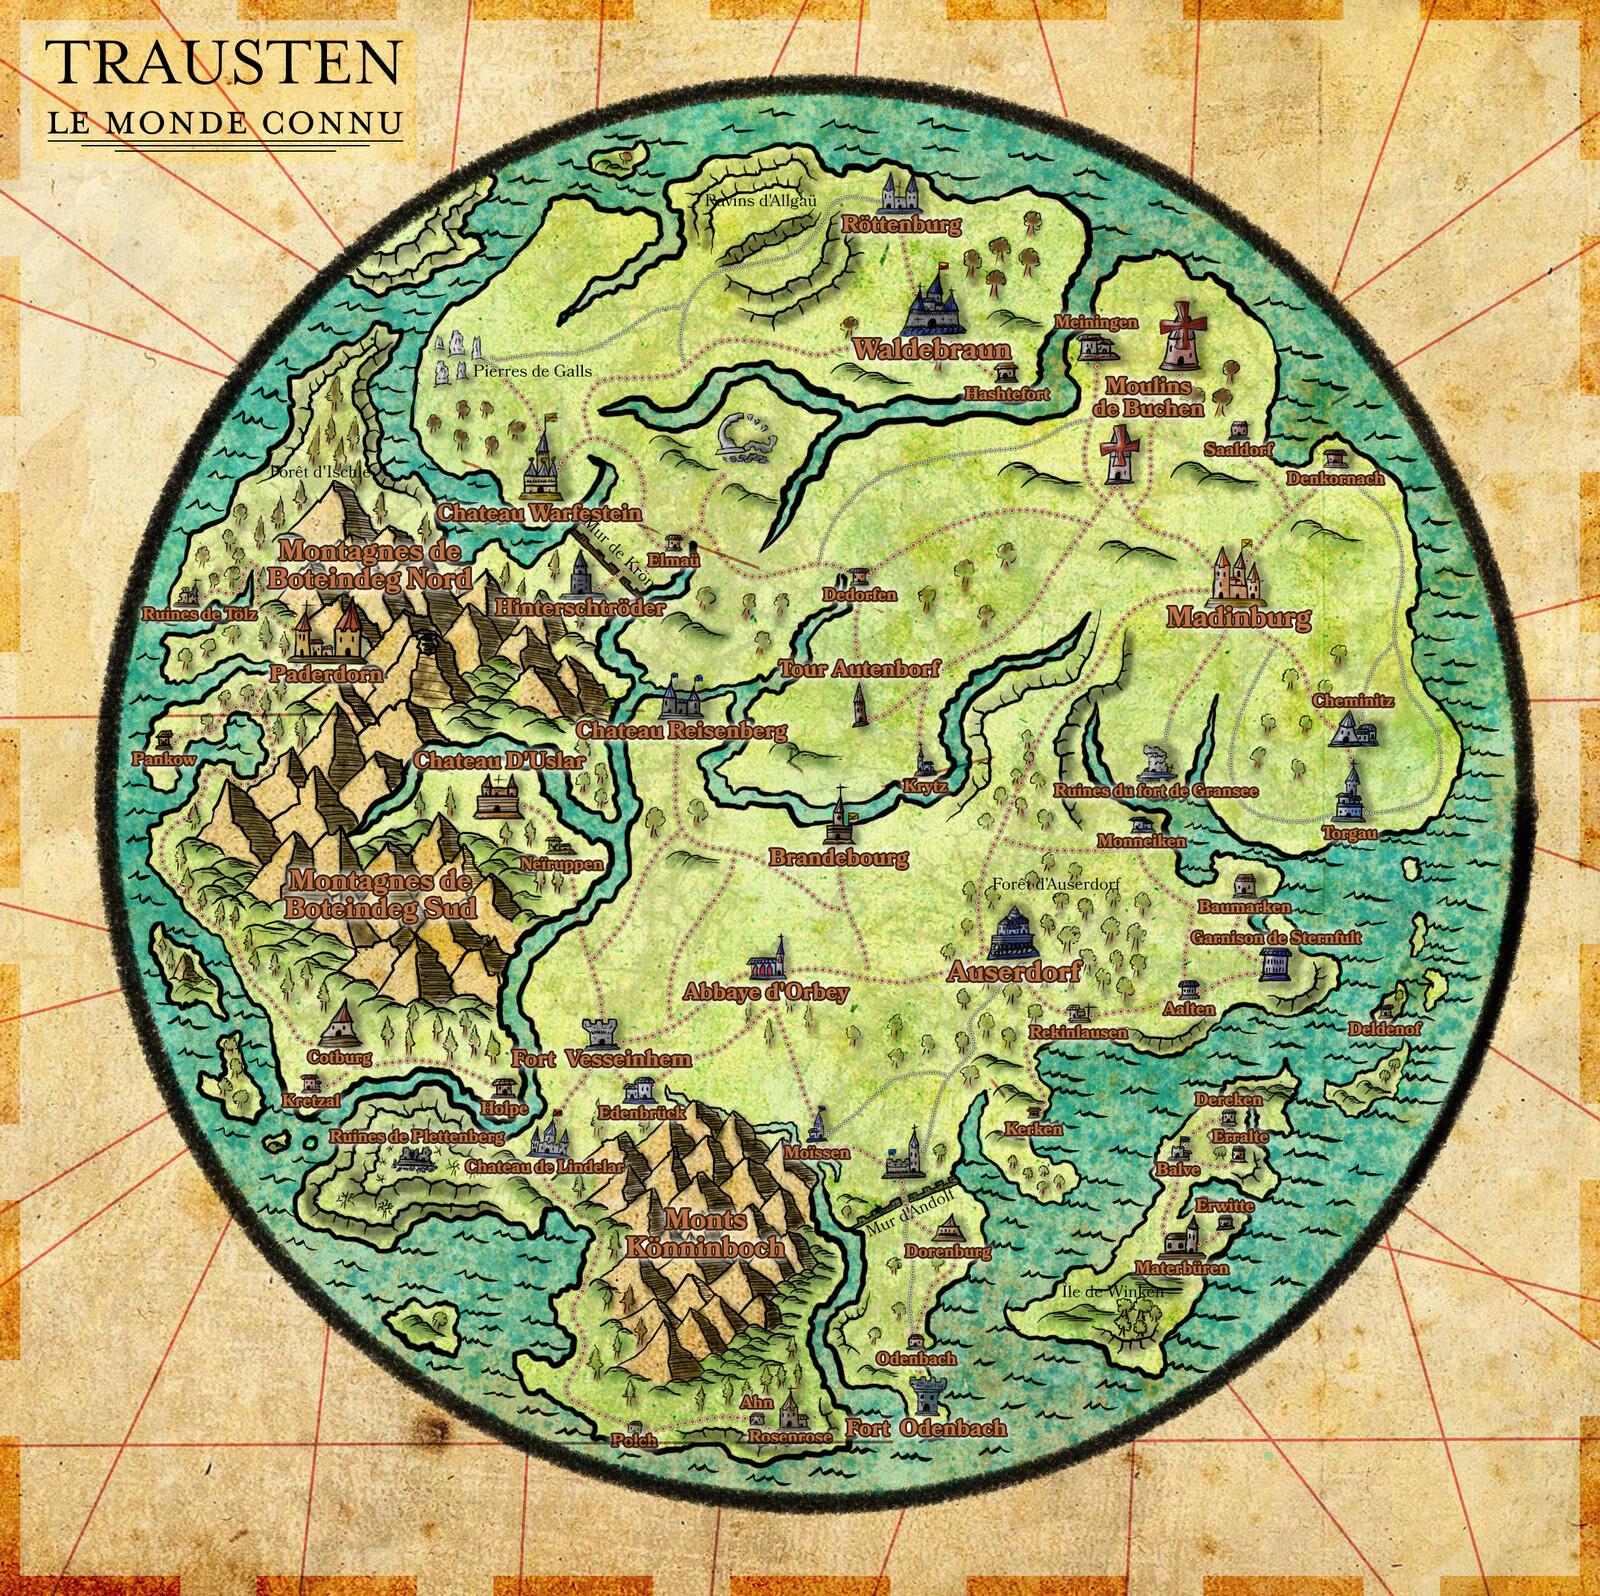 Trausten, le monde connu